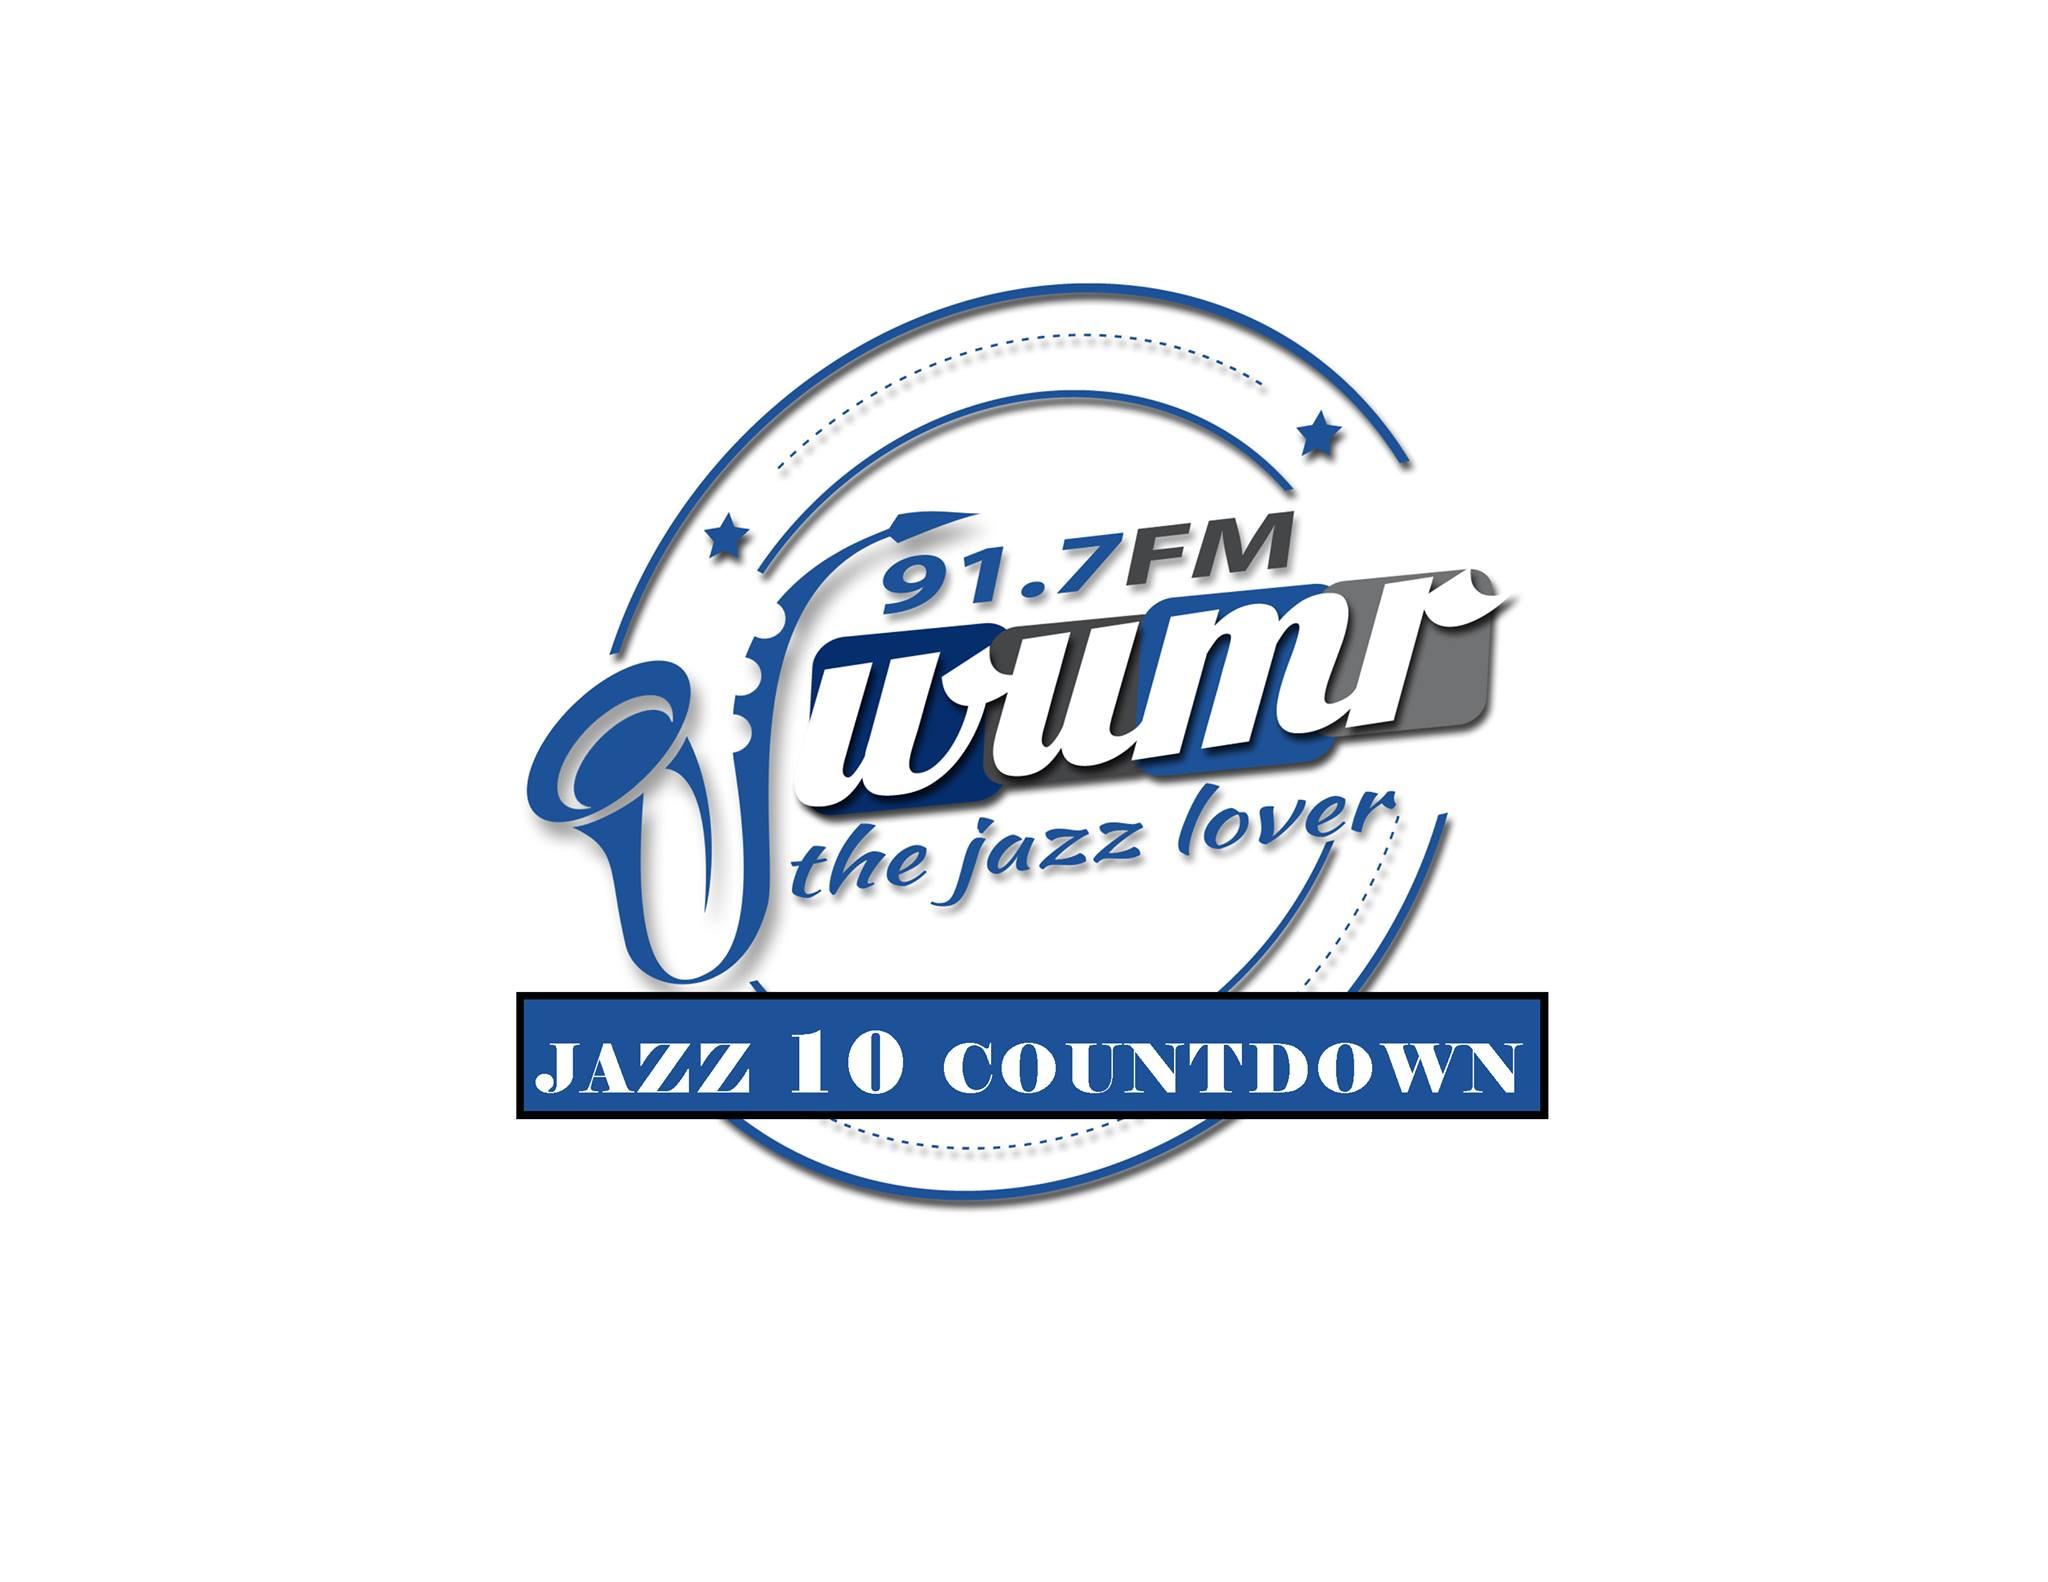 Jazz 10 Countdown